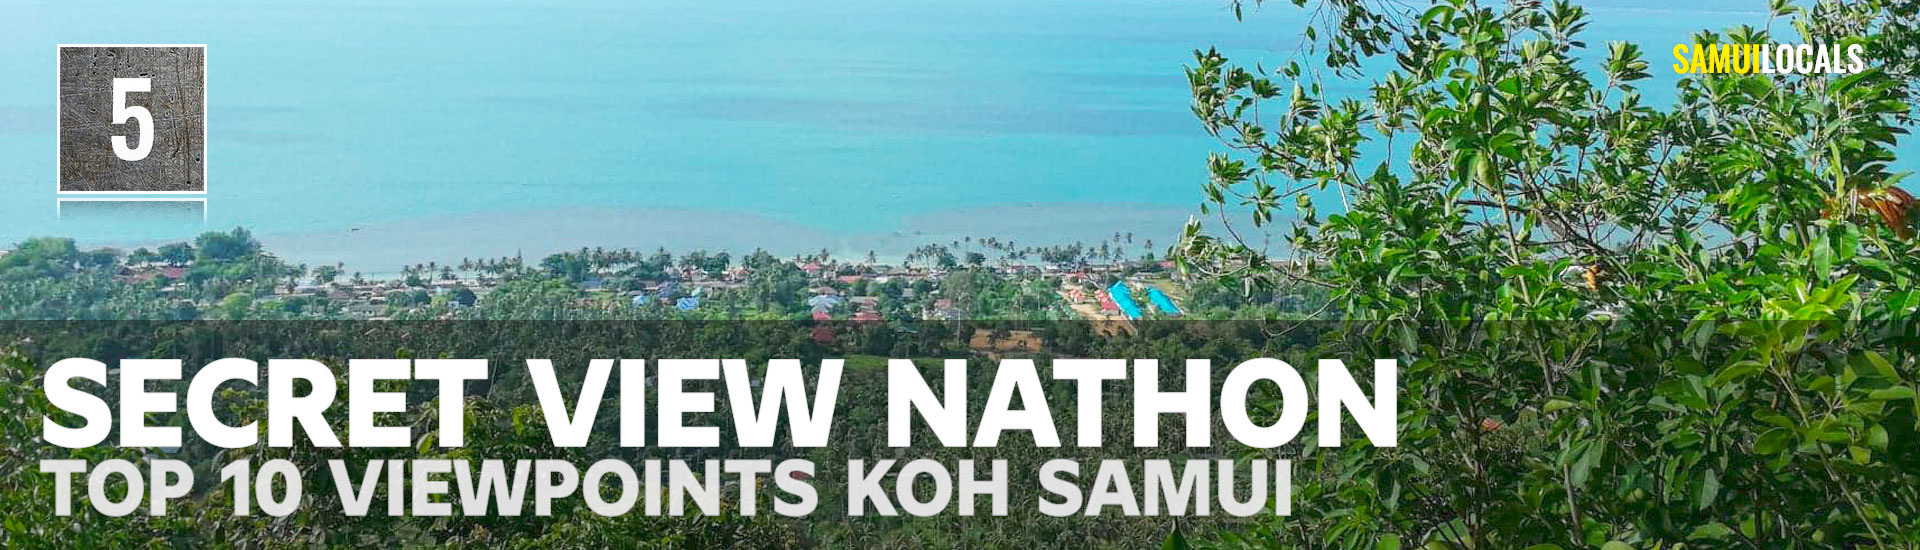 TOP-_10_Viewpoints_Koh_Samui_secret_viewpint_nathon